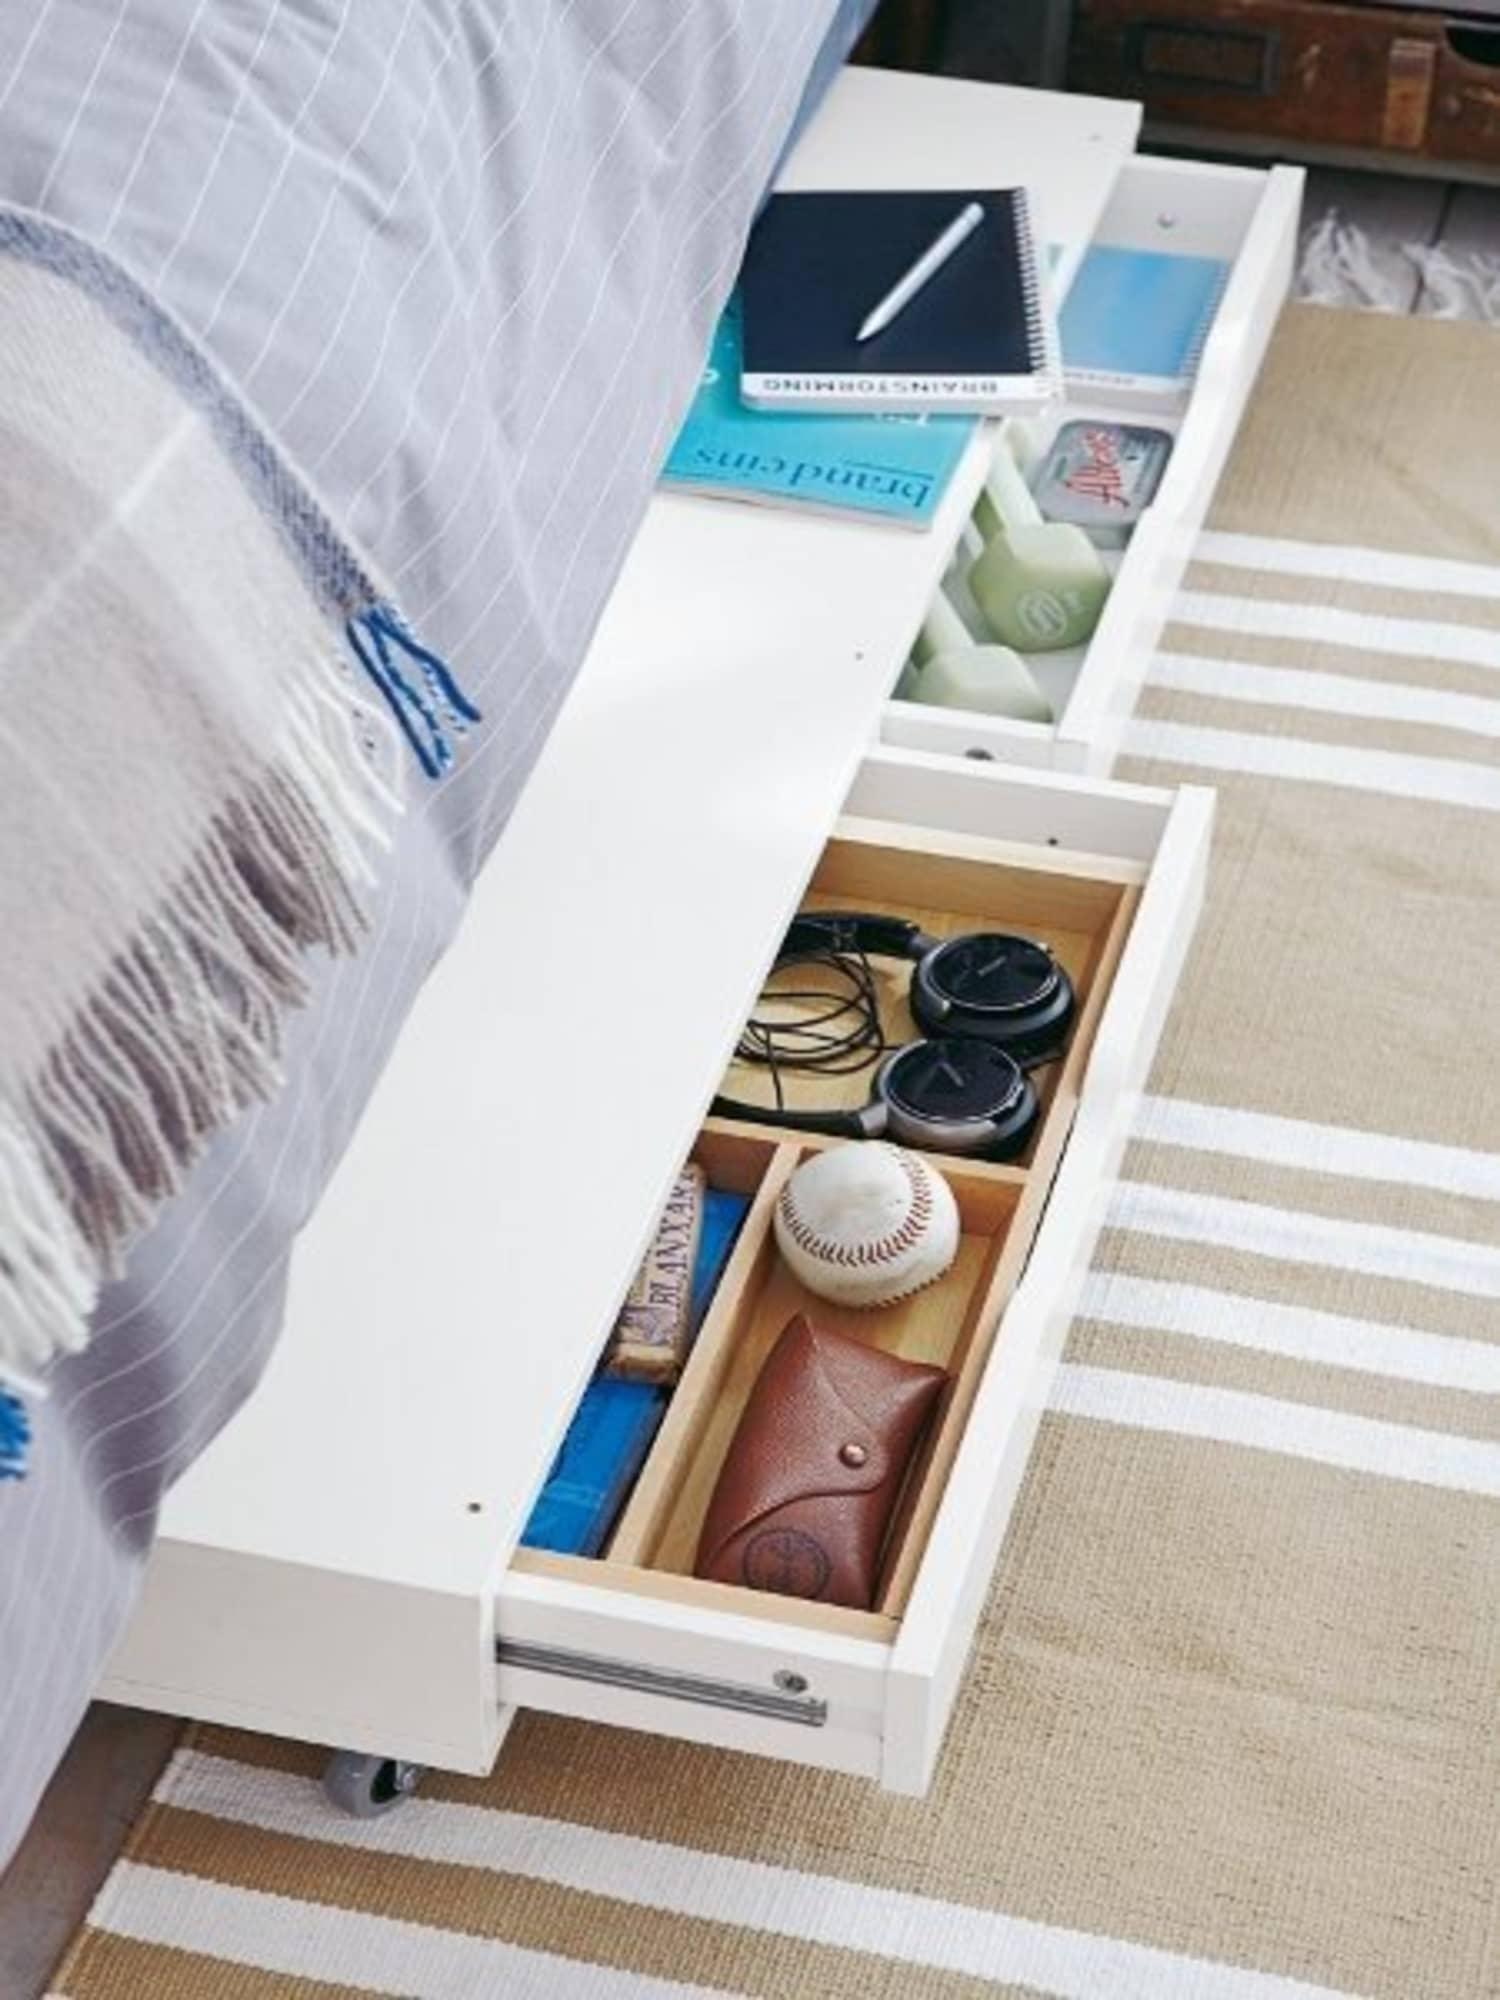 Clean Dorm Room: A Dozen Tips For A Super-Organized Dorm Room